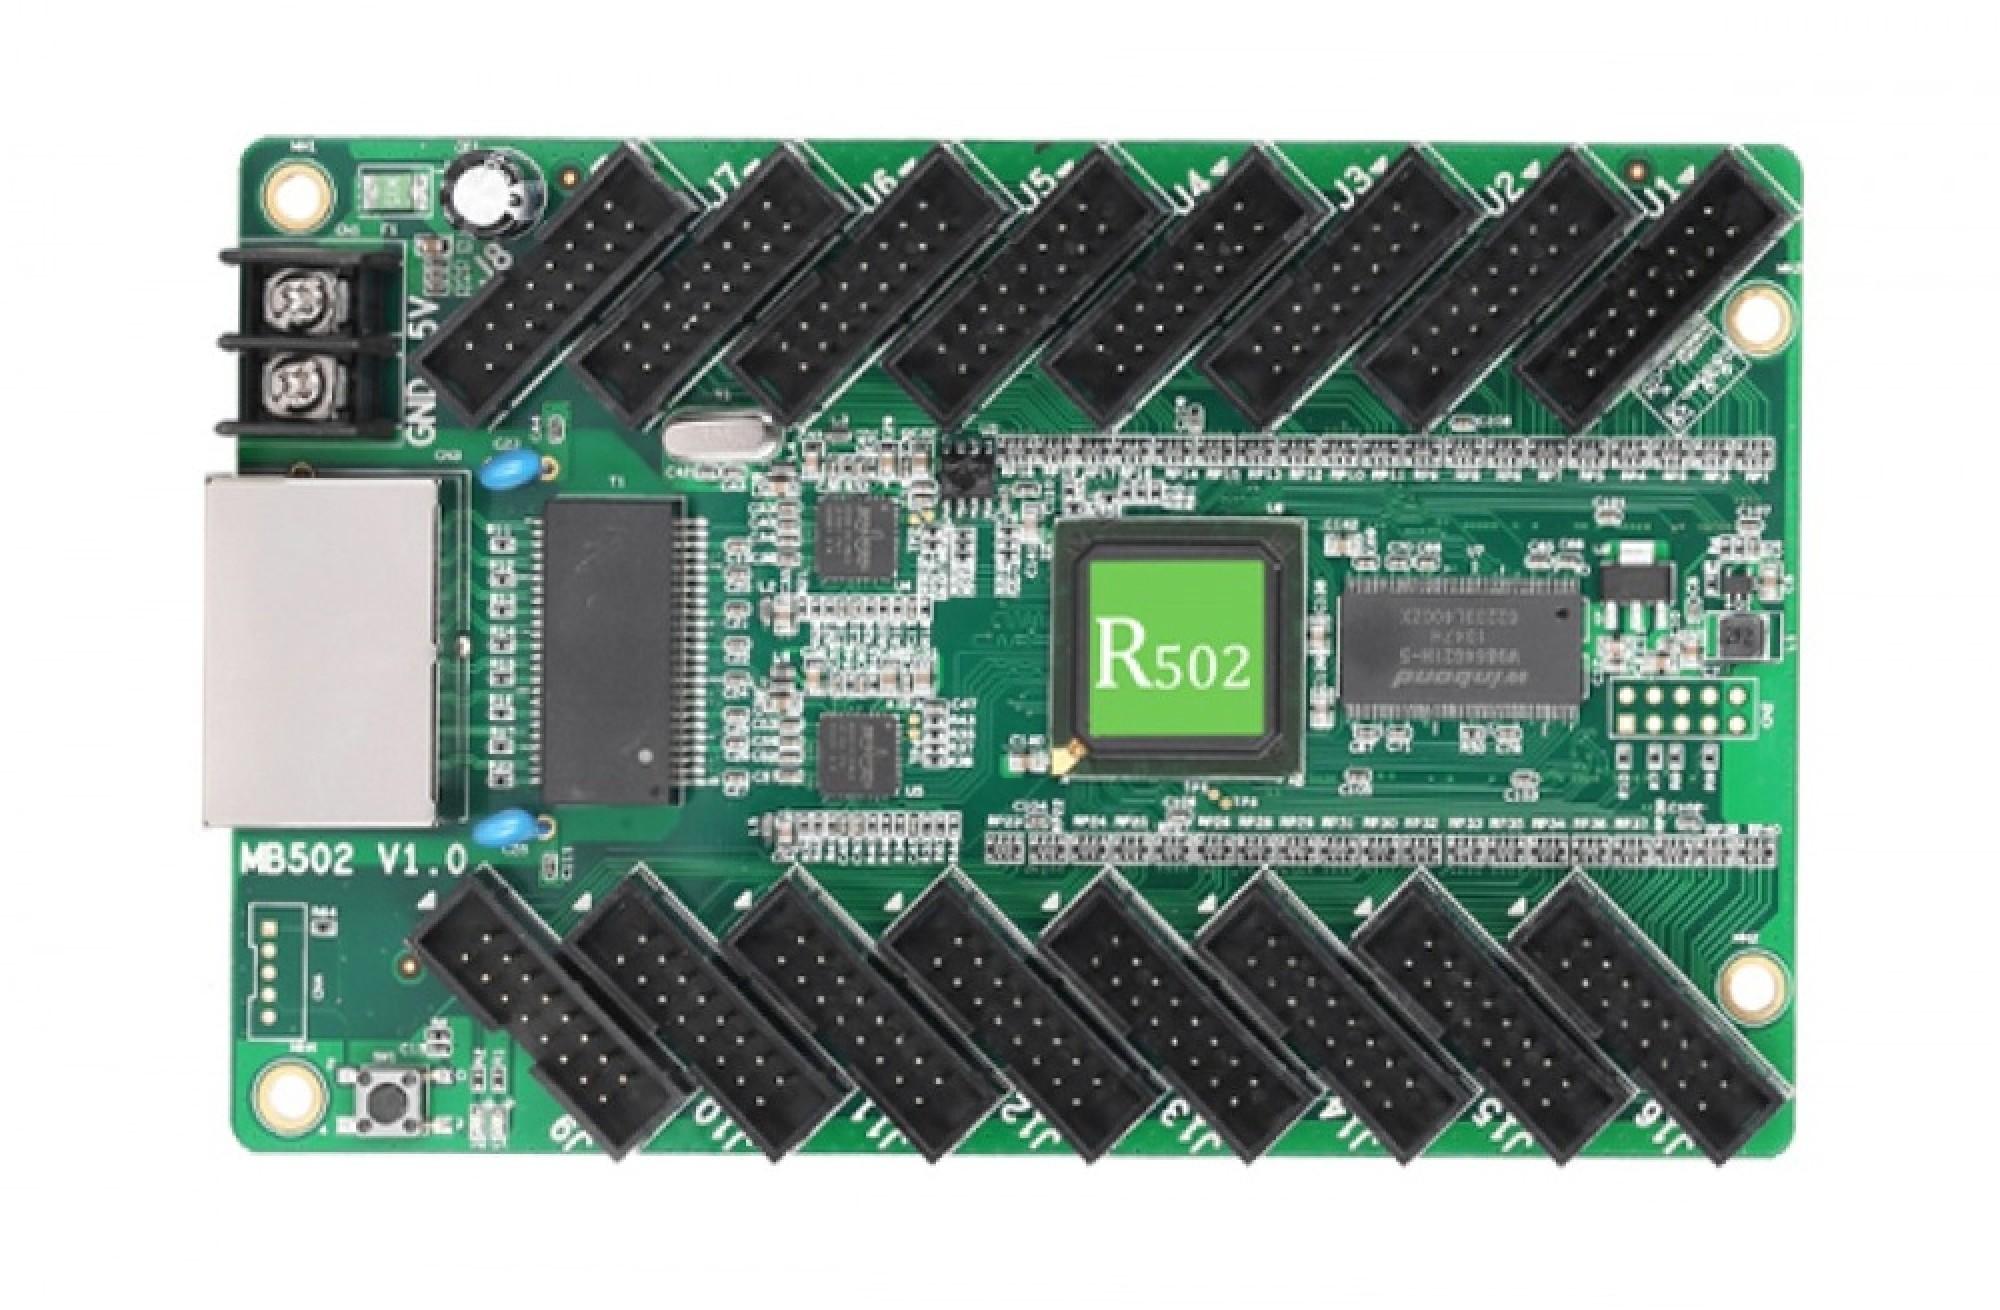 Huidu R502 LED Display Cascading Receiving Card 256x256